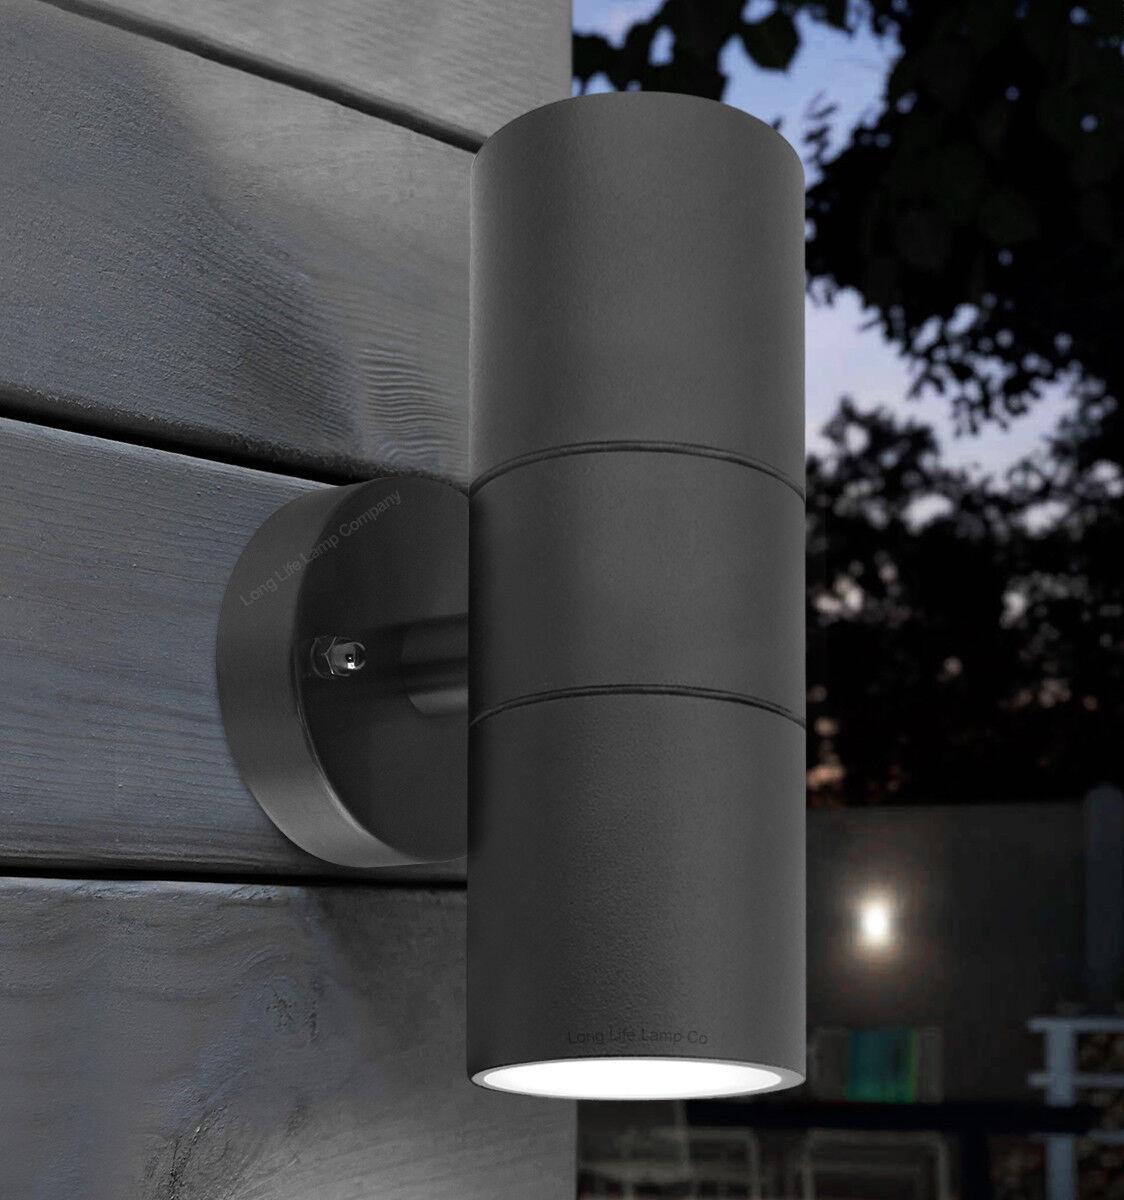 DEL double jardin extérieur Mur Lumières en Acier Inoxydable Up Down Wall Lights IP65